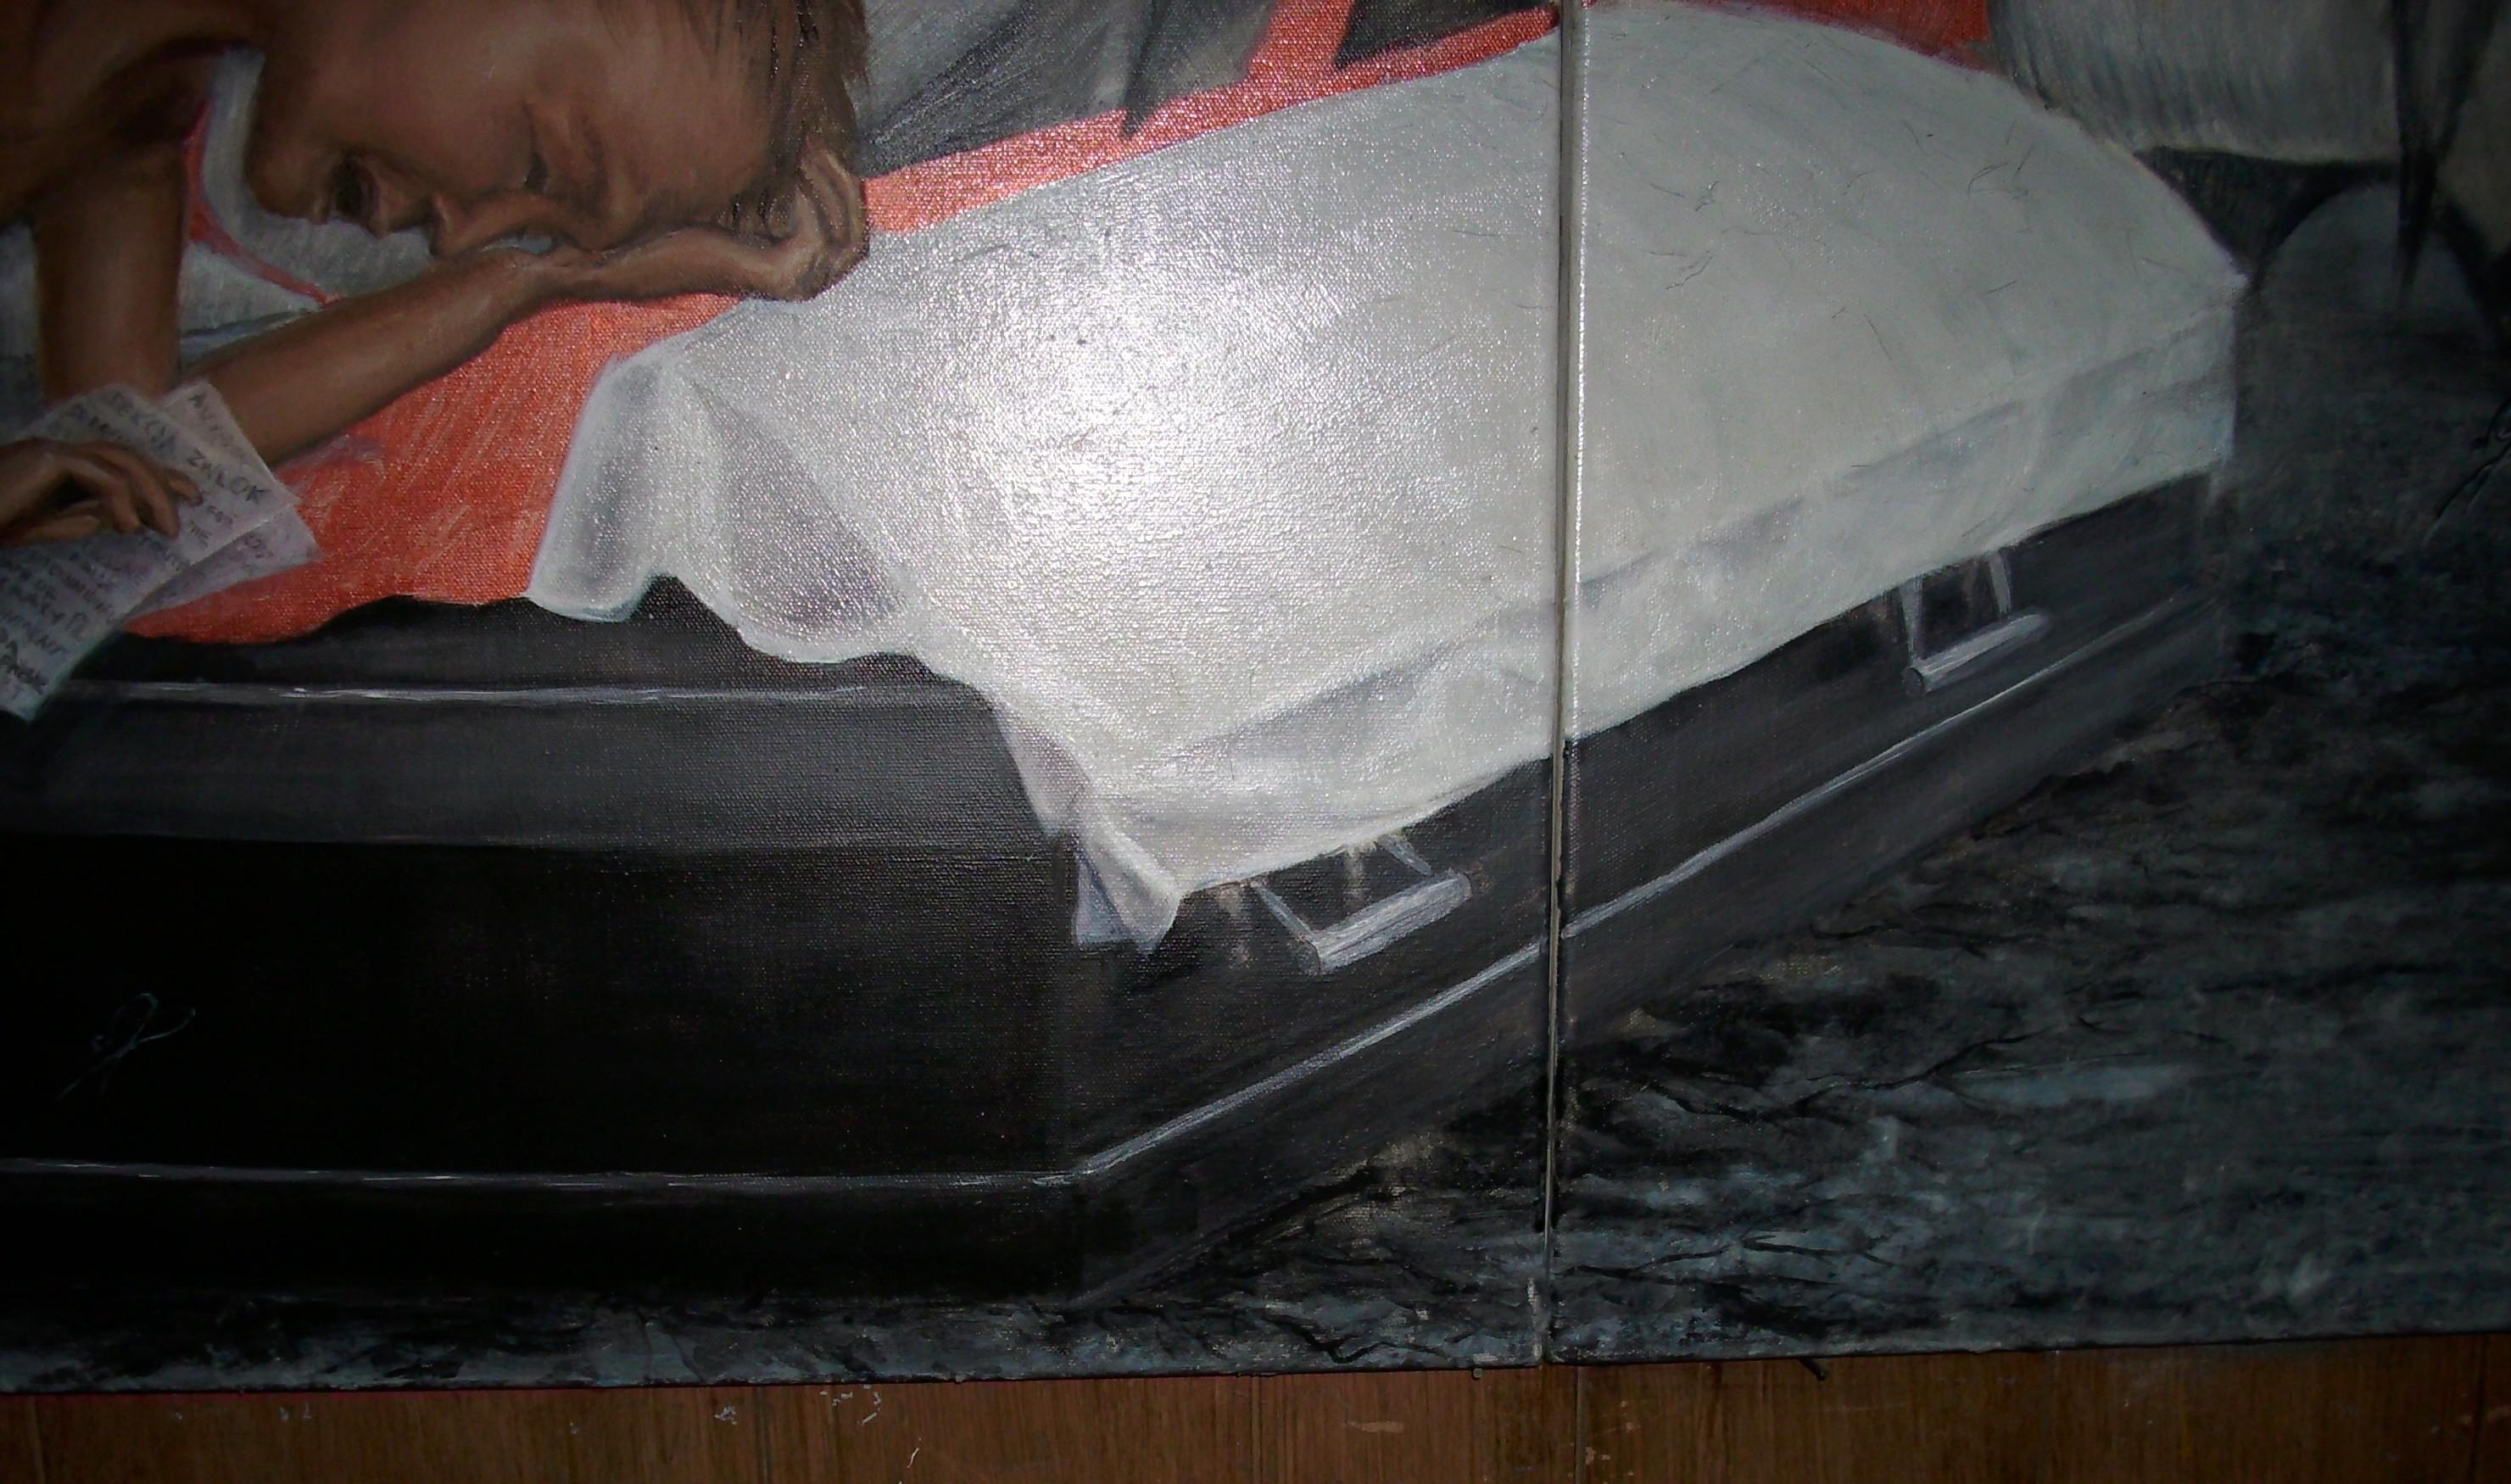 Coffin-Corpses-Black-Box-Intelligent-Oil-Paintings-by-Marta-Jelen-Sytniewski-significant-art-Smolensk-Catastrophe-SignificantArt.com-Chicago-IL-4.jpg